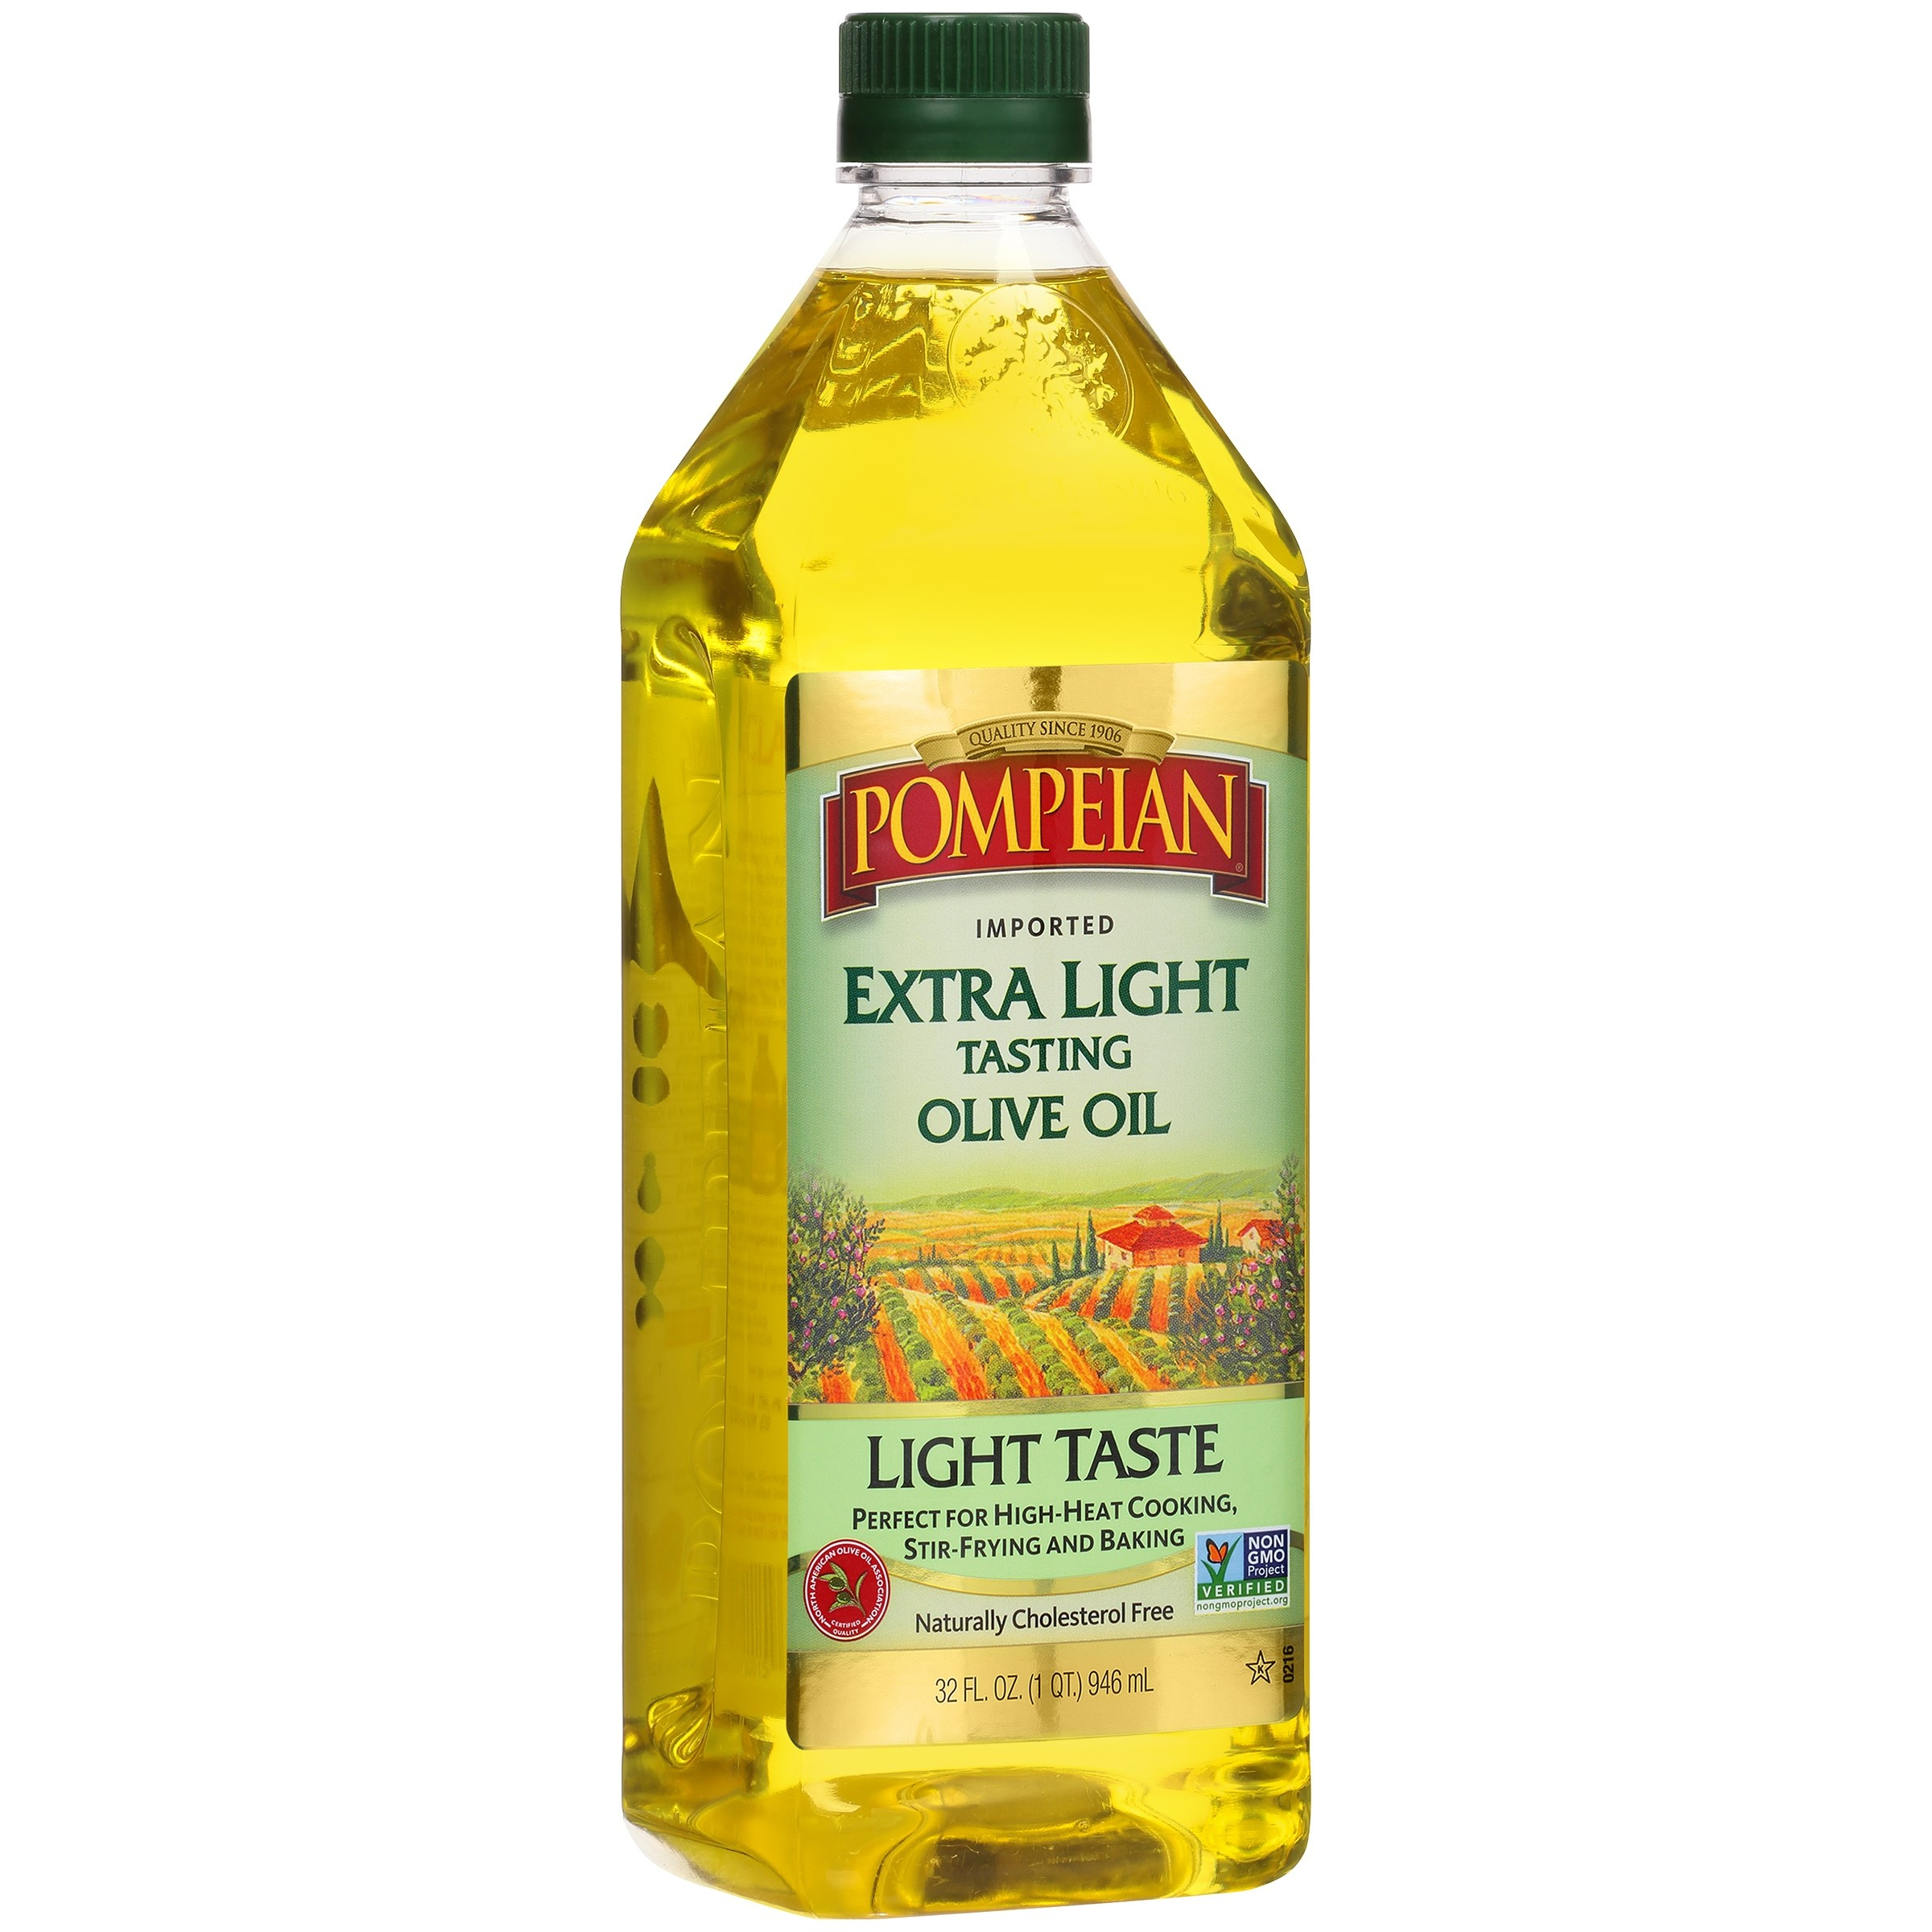 Pompeian Imported Extra Light Tasting Olive Oil Light Taste, 32.0 FL OZ